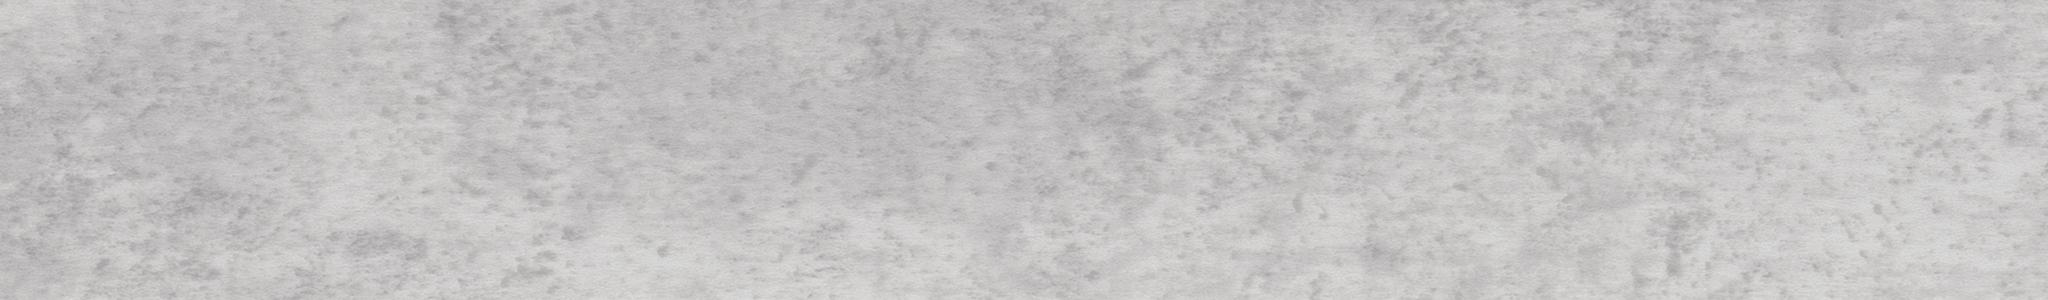 HD 297644 ABS Edge Bellato Grey Smooth Softmatt